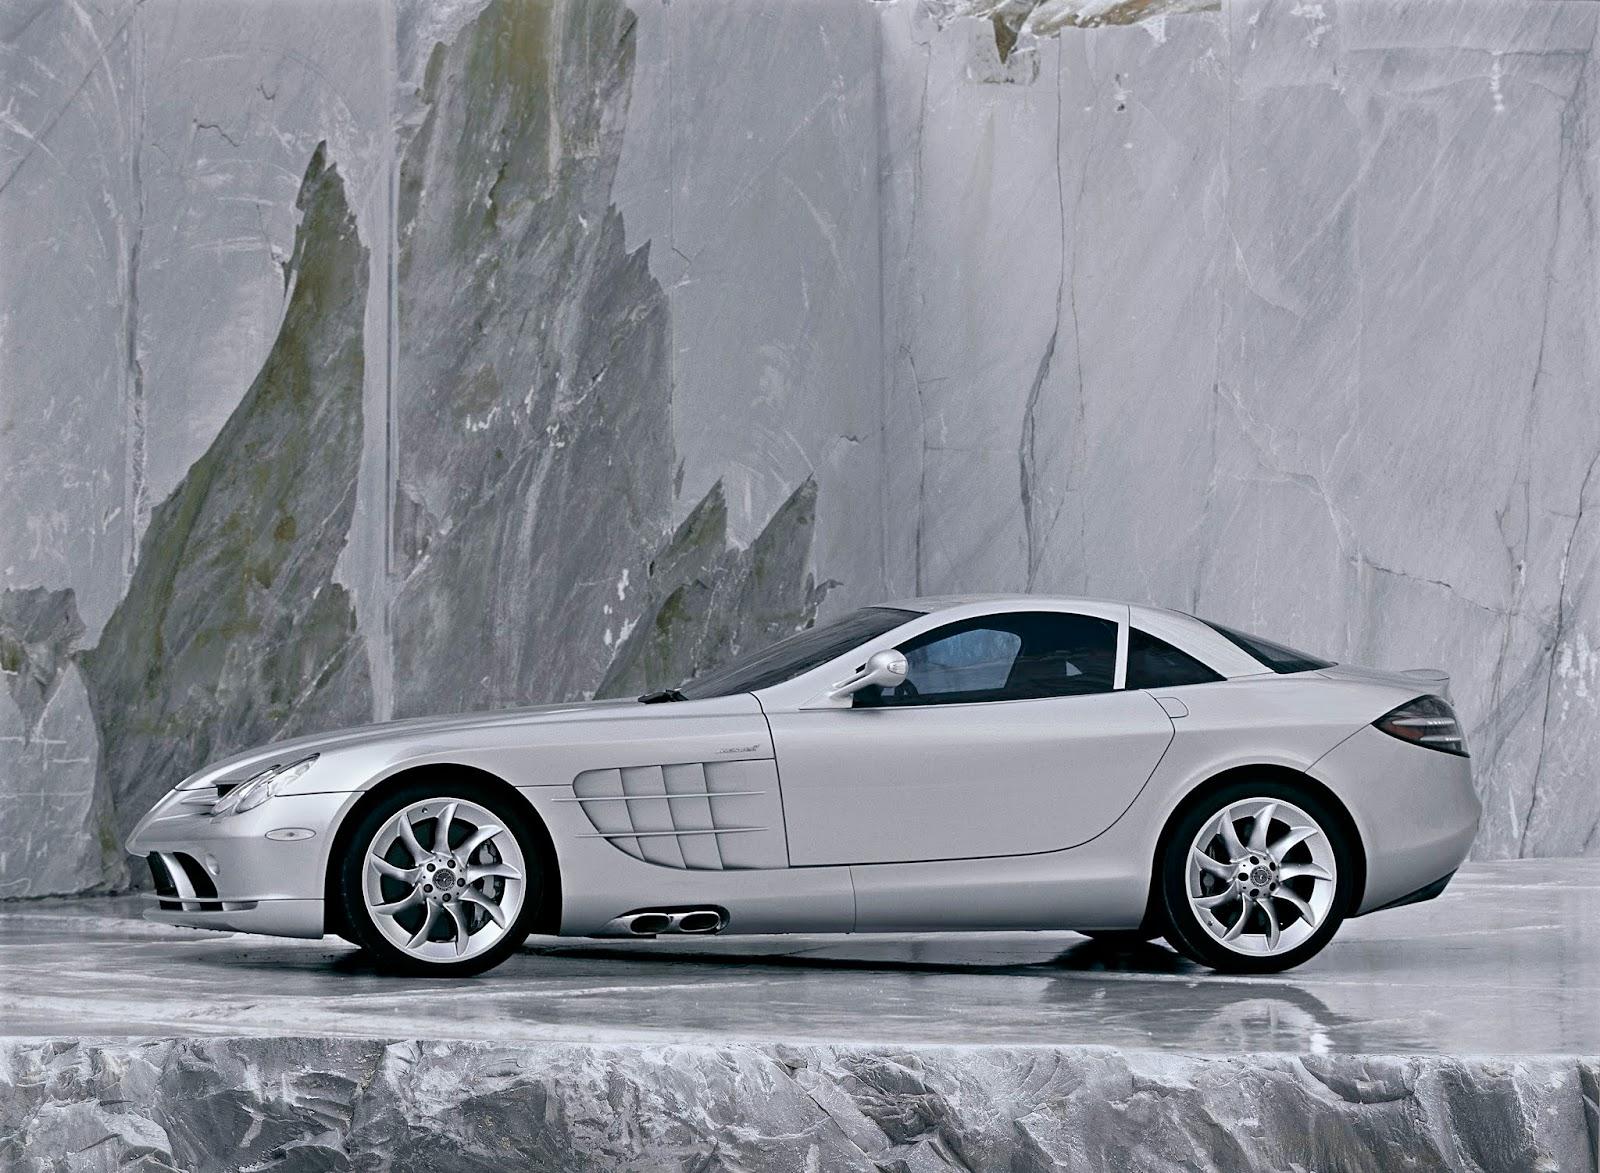 a2003f4098 Ποια είναι η θρυλική 300 SLR 300 SLR, Benz, Mercedes, Mercedes Benz, retrocar, retrocar sunday, vintage, zblog